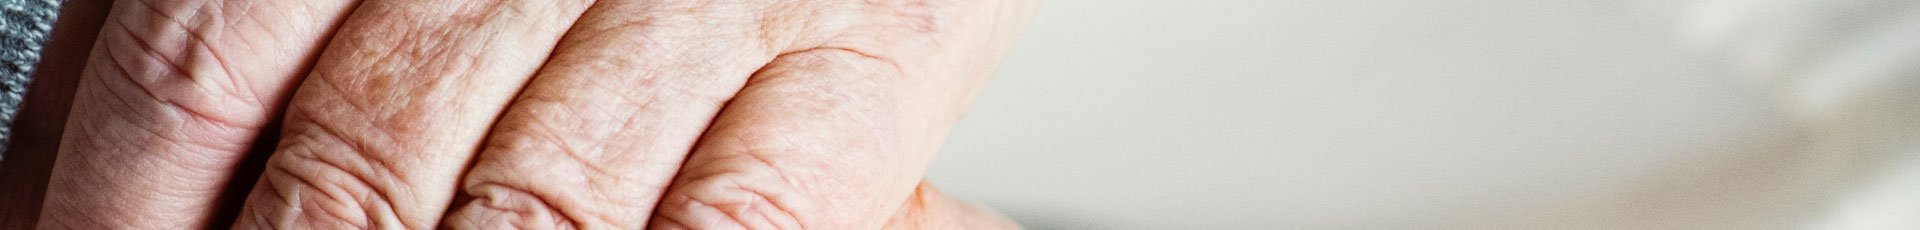 Pflegepersonal aus Polen | Pflegevermittlung Makolla